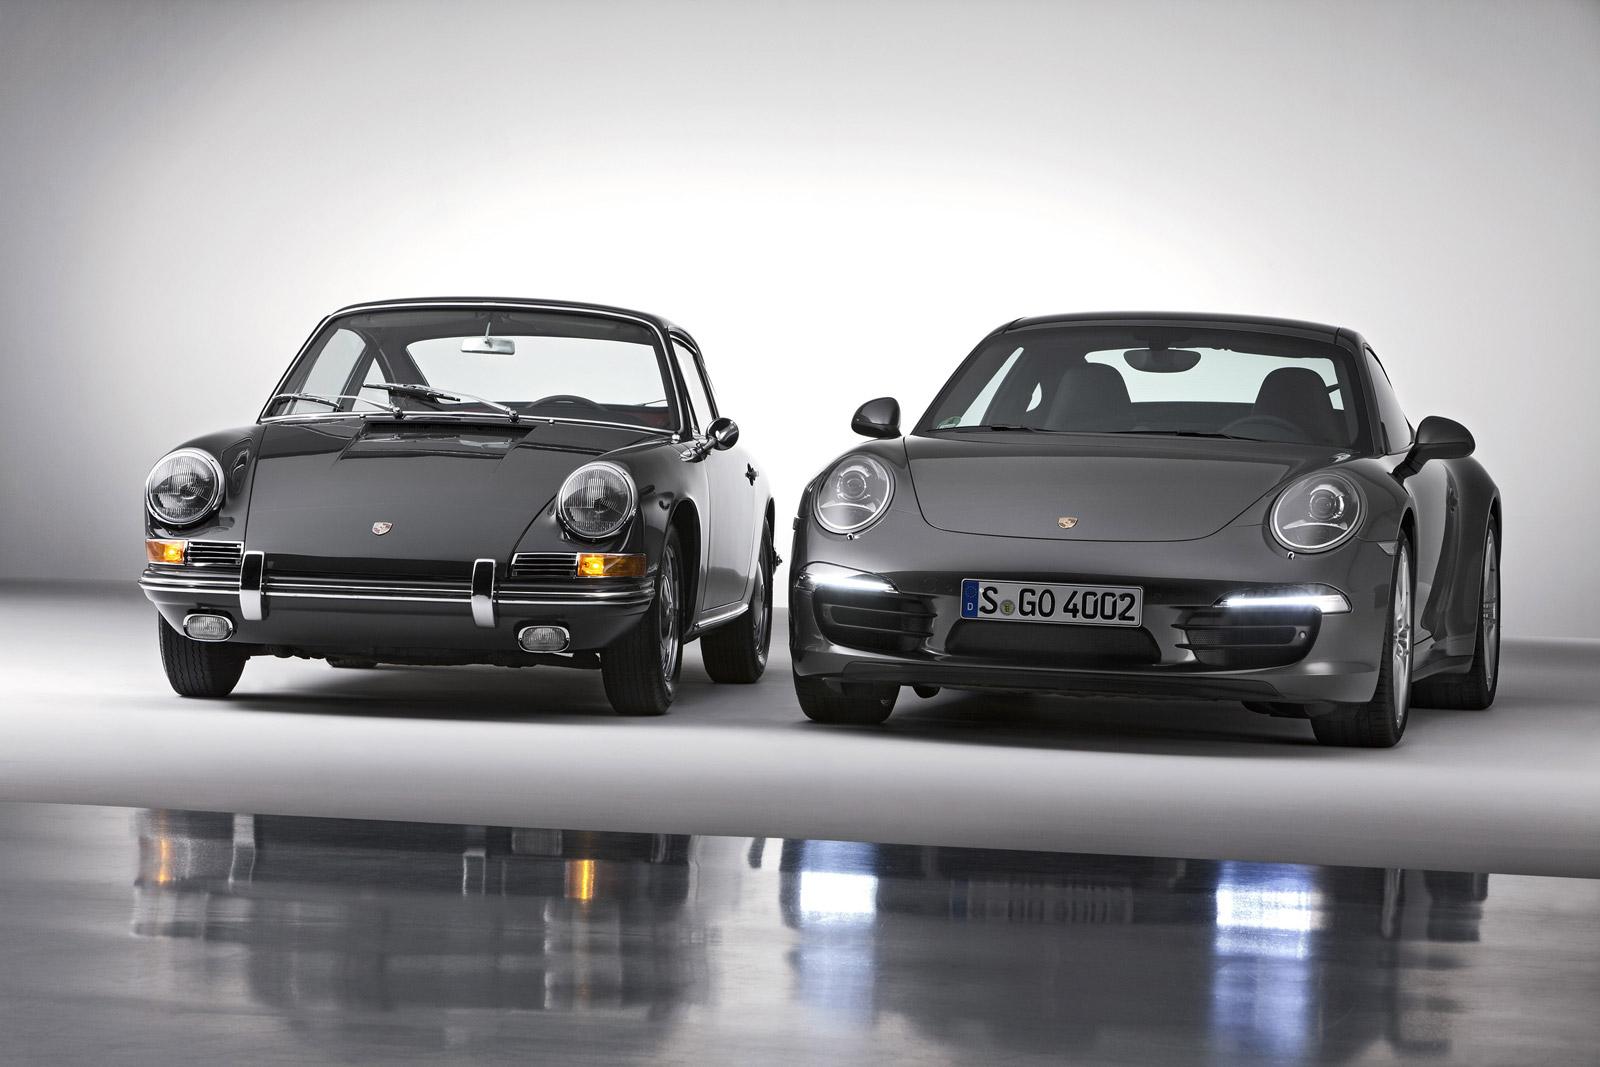 Porsche Announces 50th Anniversary Celebrations For The 911